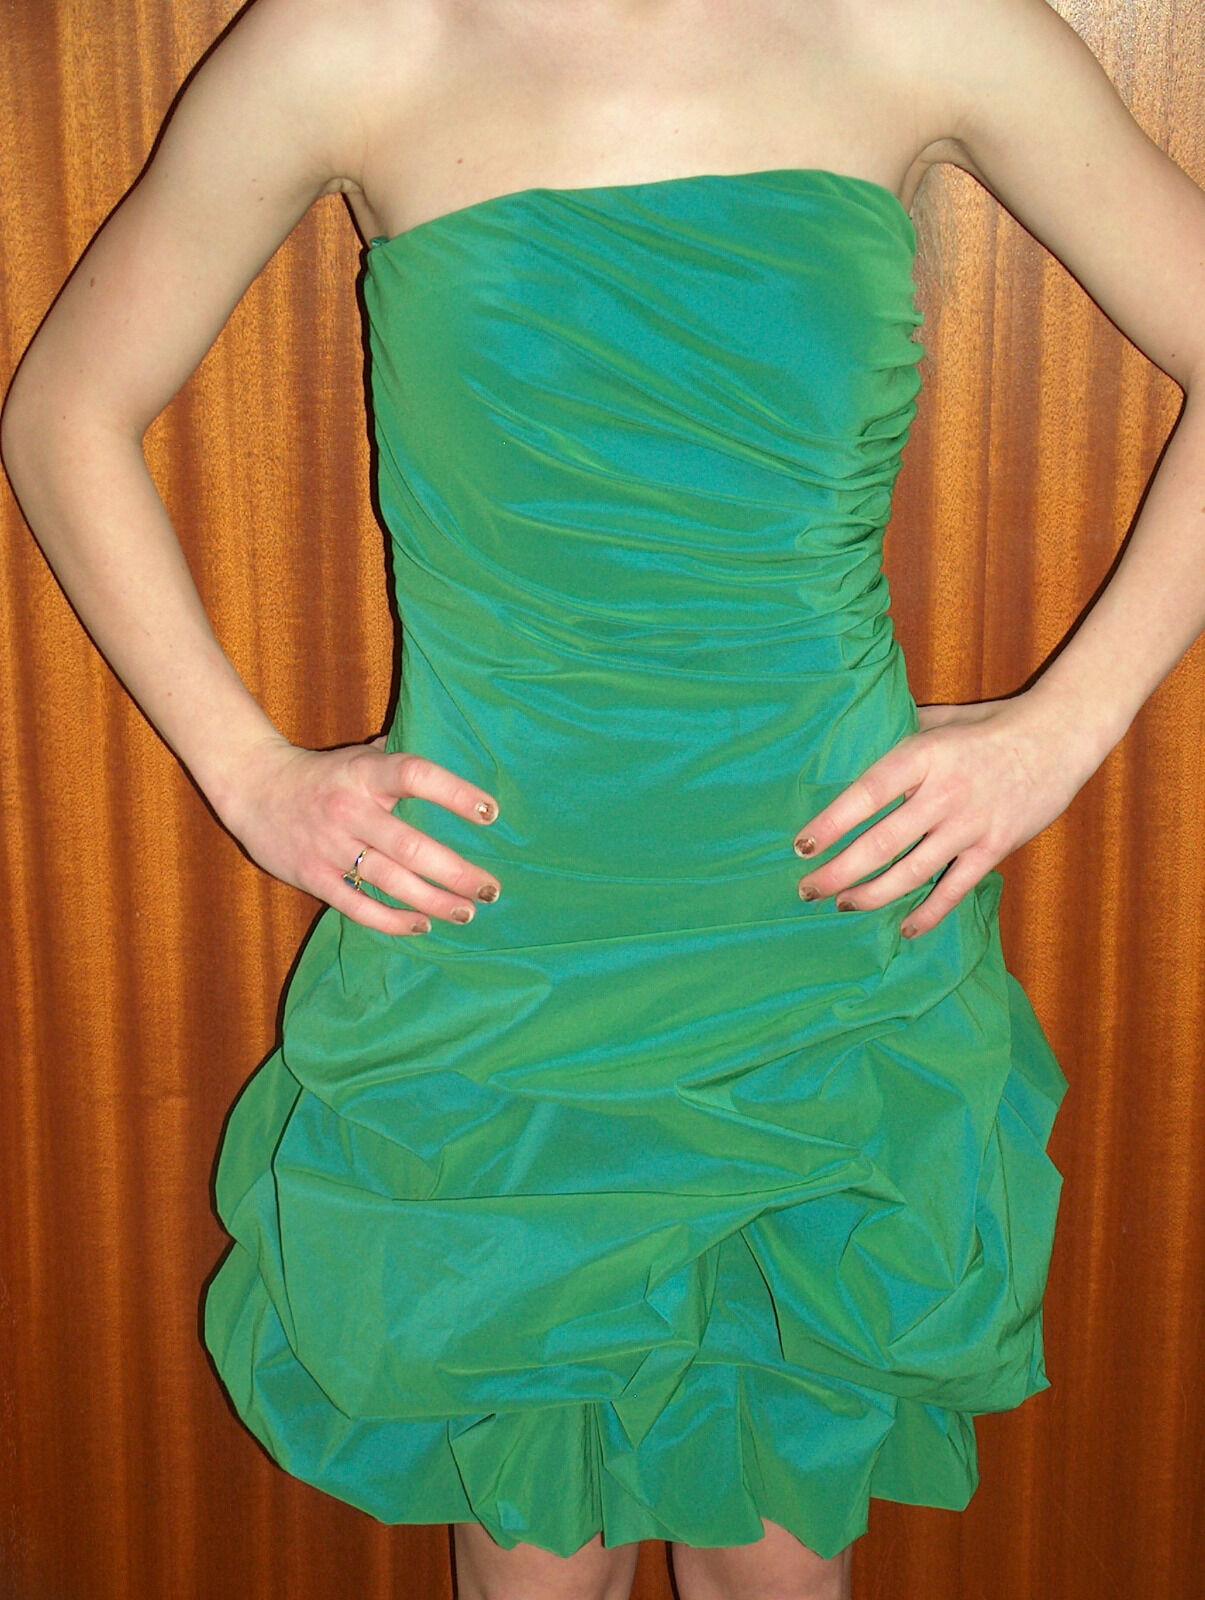 Damenmode - Kleider - Ballkleider - Cocktailkleid Gr. 32 Neptungrün